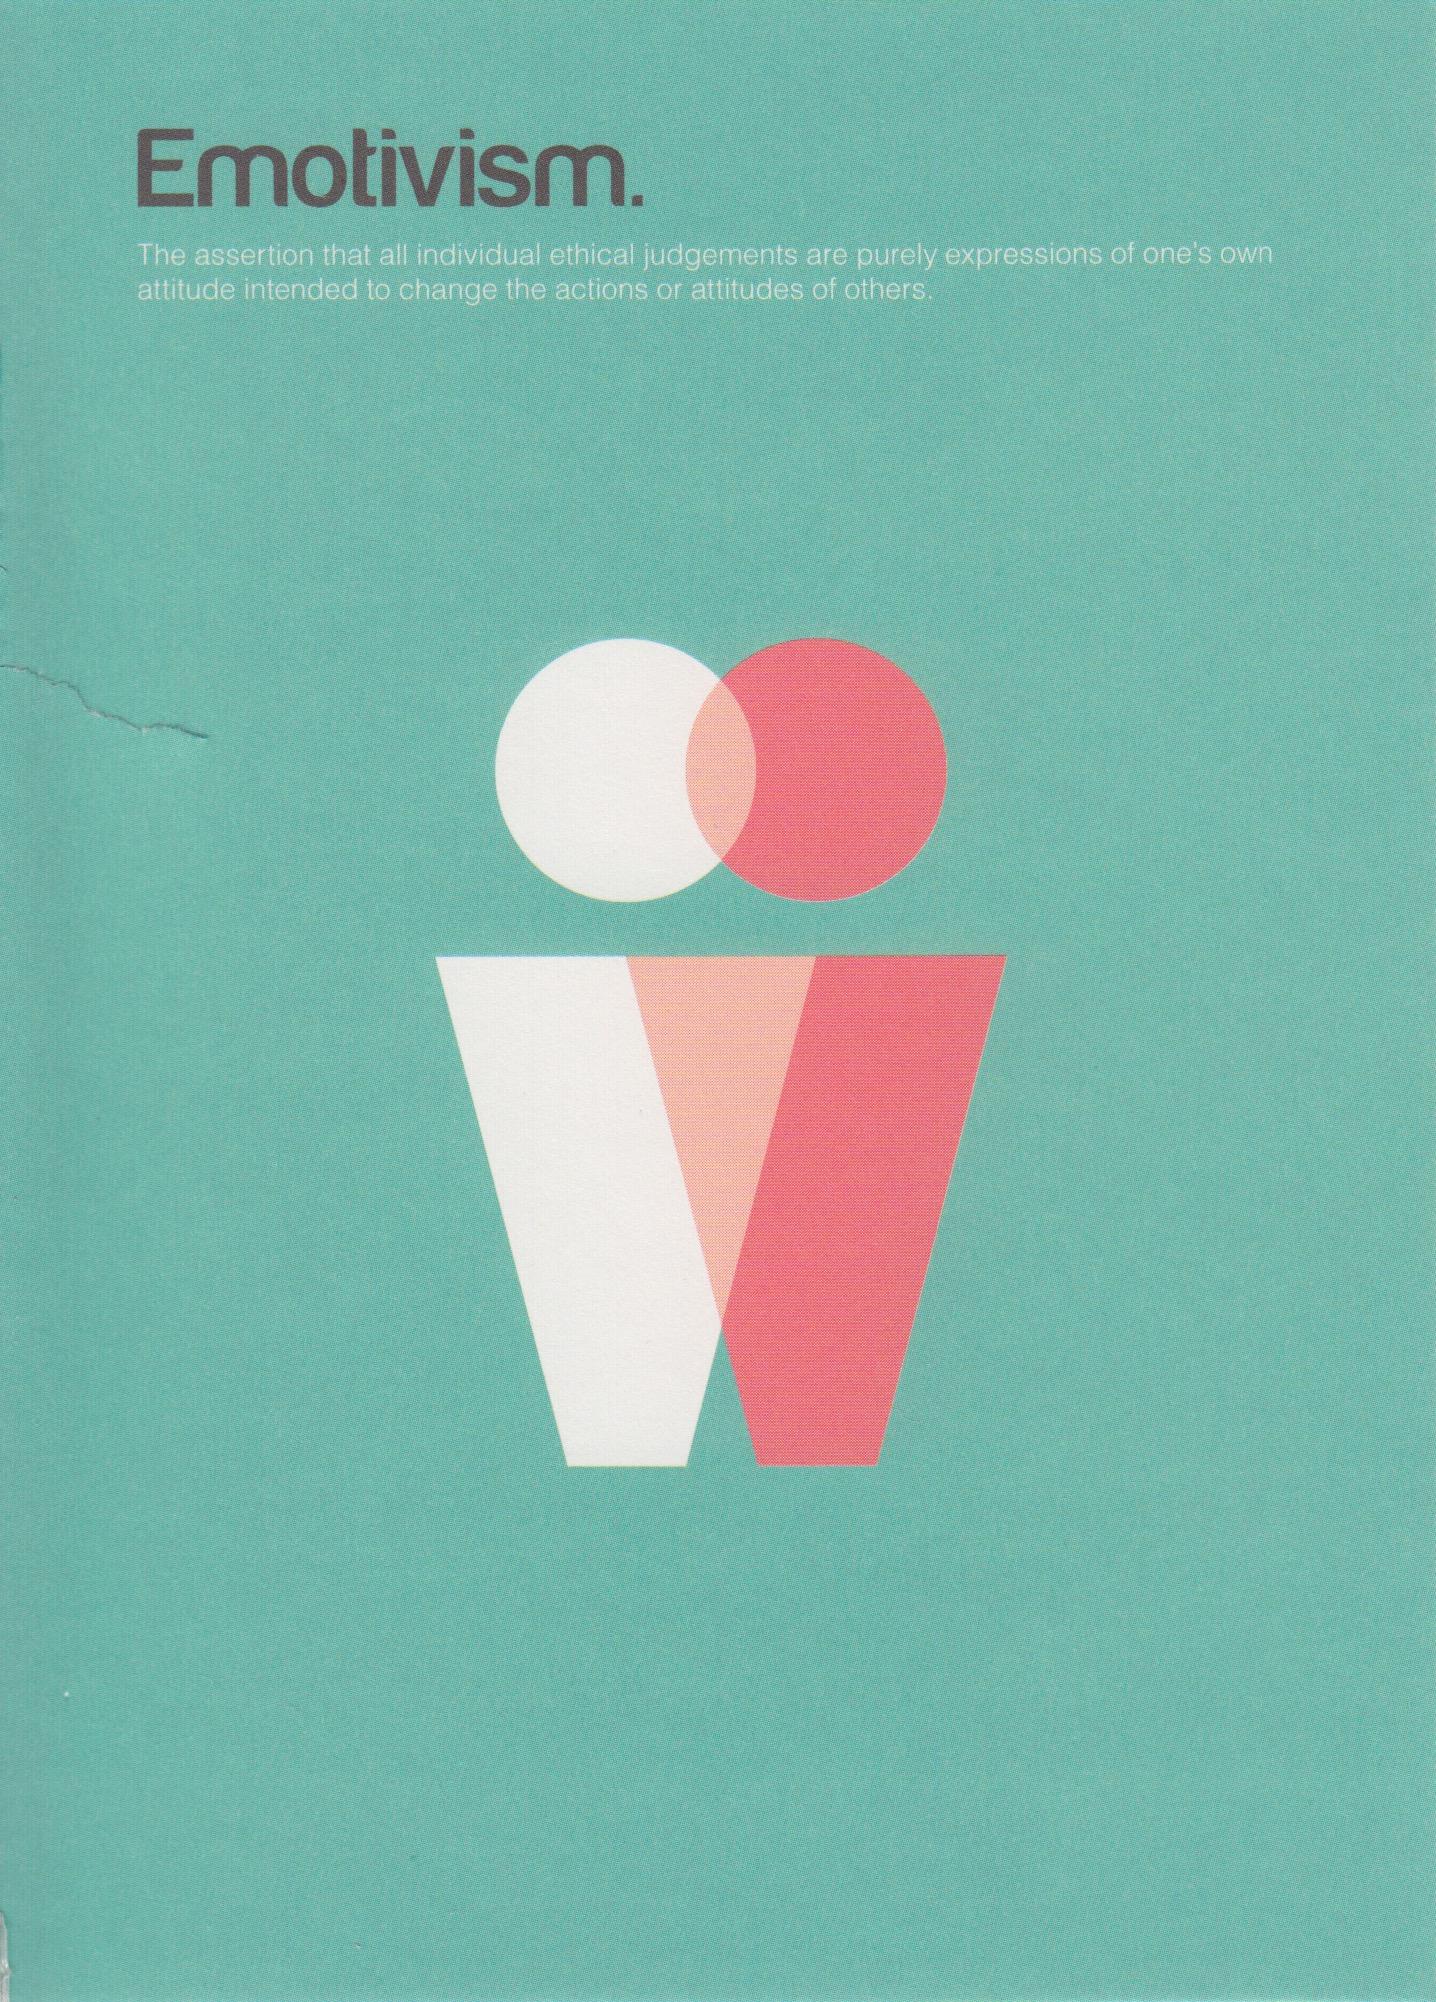 philographics-emotivism